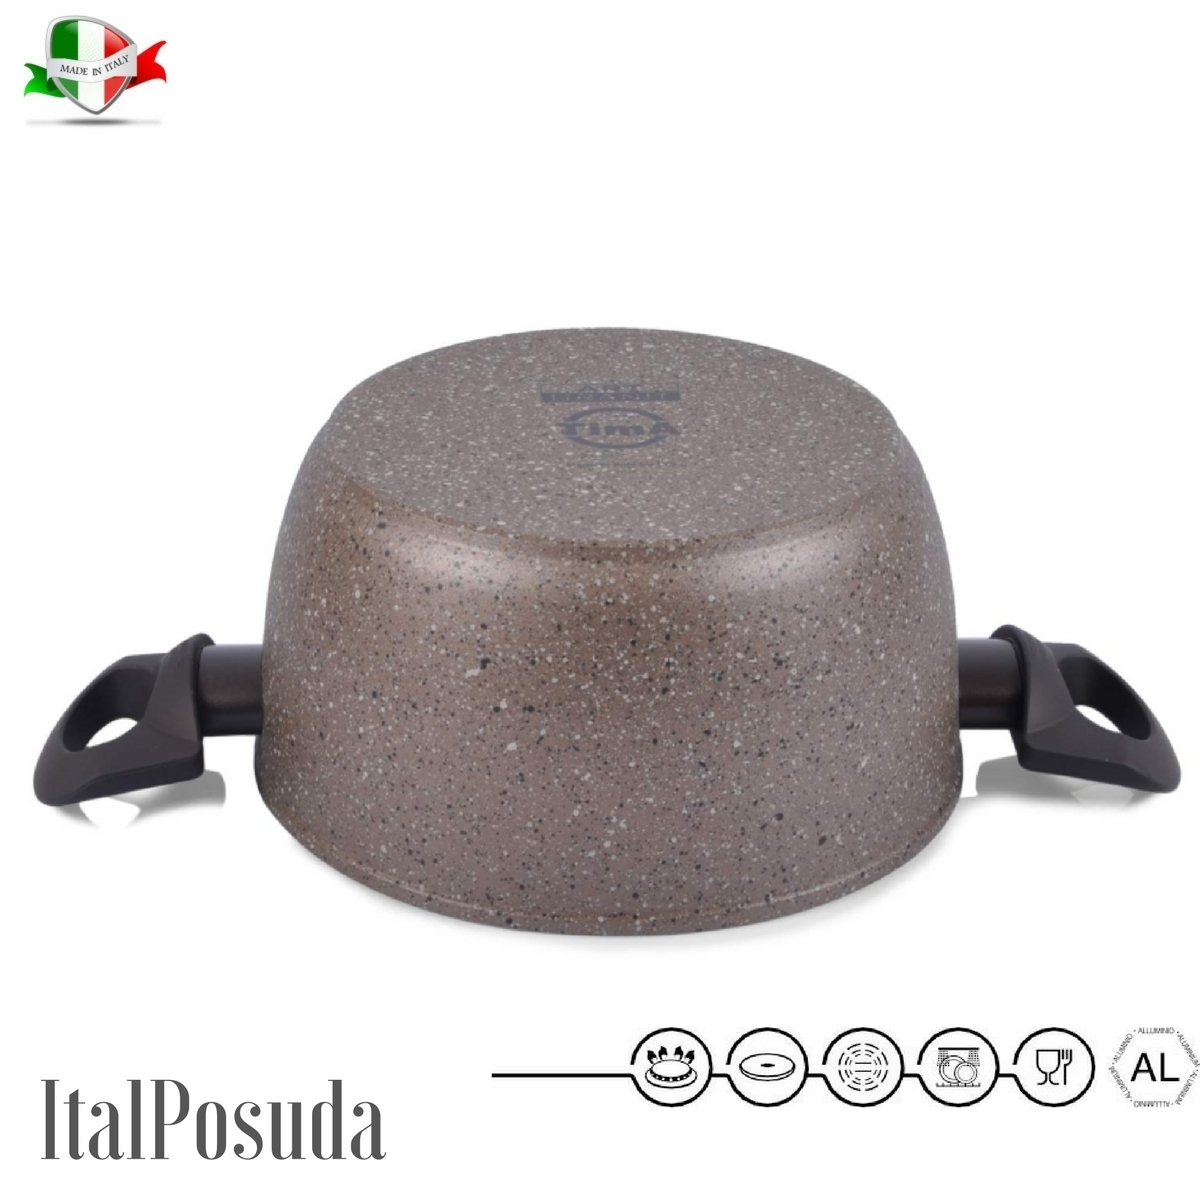 www.ital-posuda.ru. Кастрюля TIMA Art Granit индукционная 24 см /4,5 литра